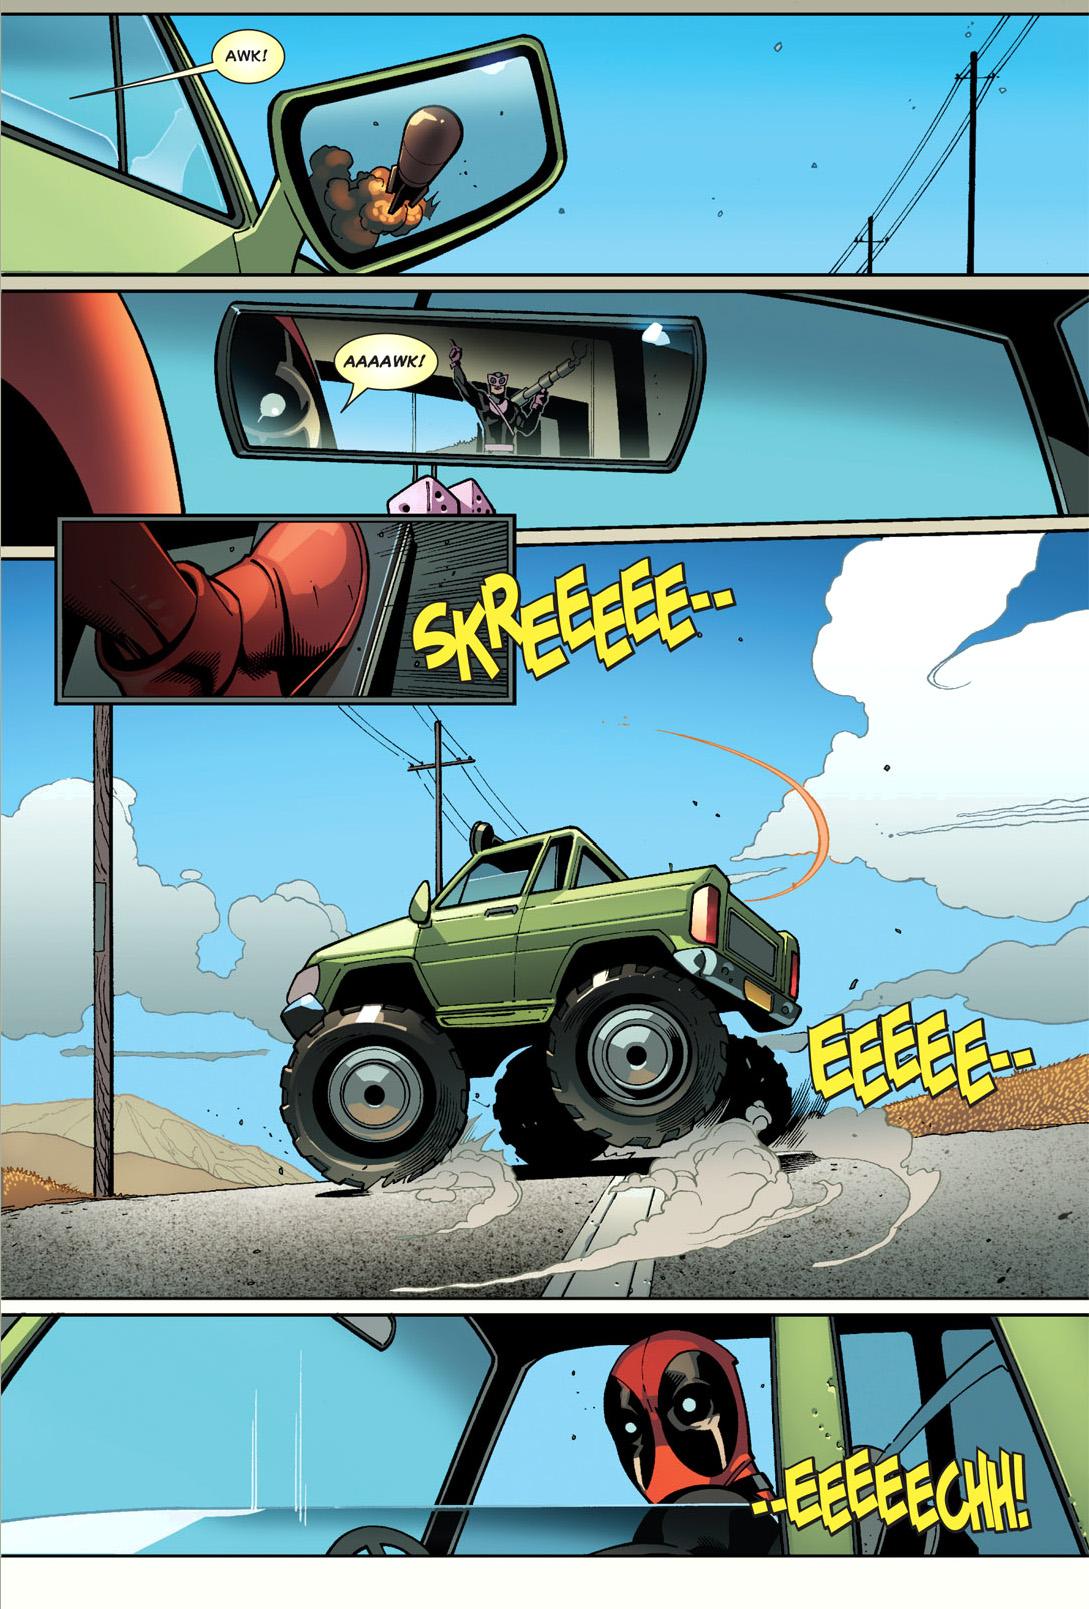 deadpool's mad driving skills